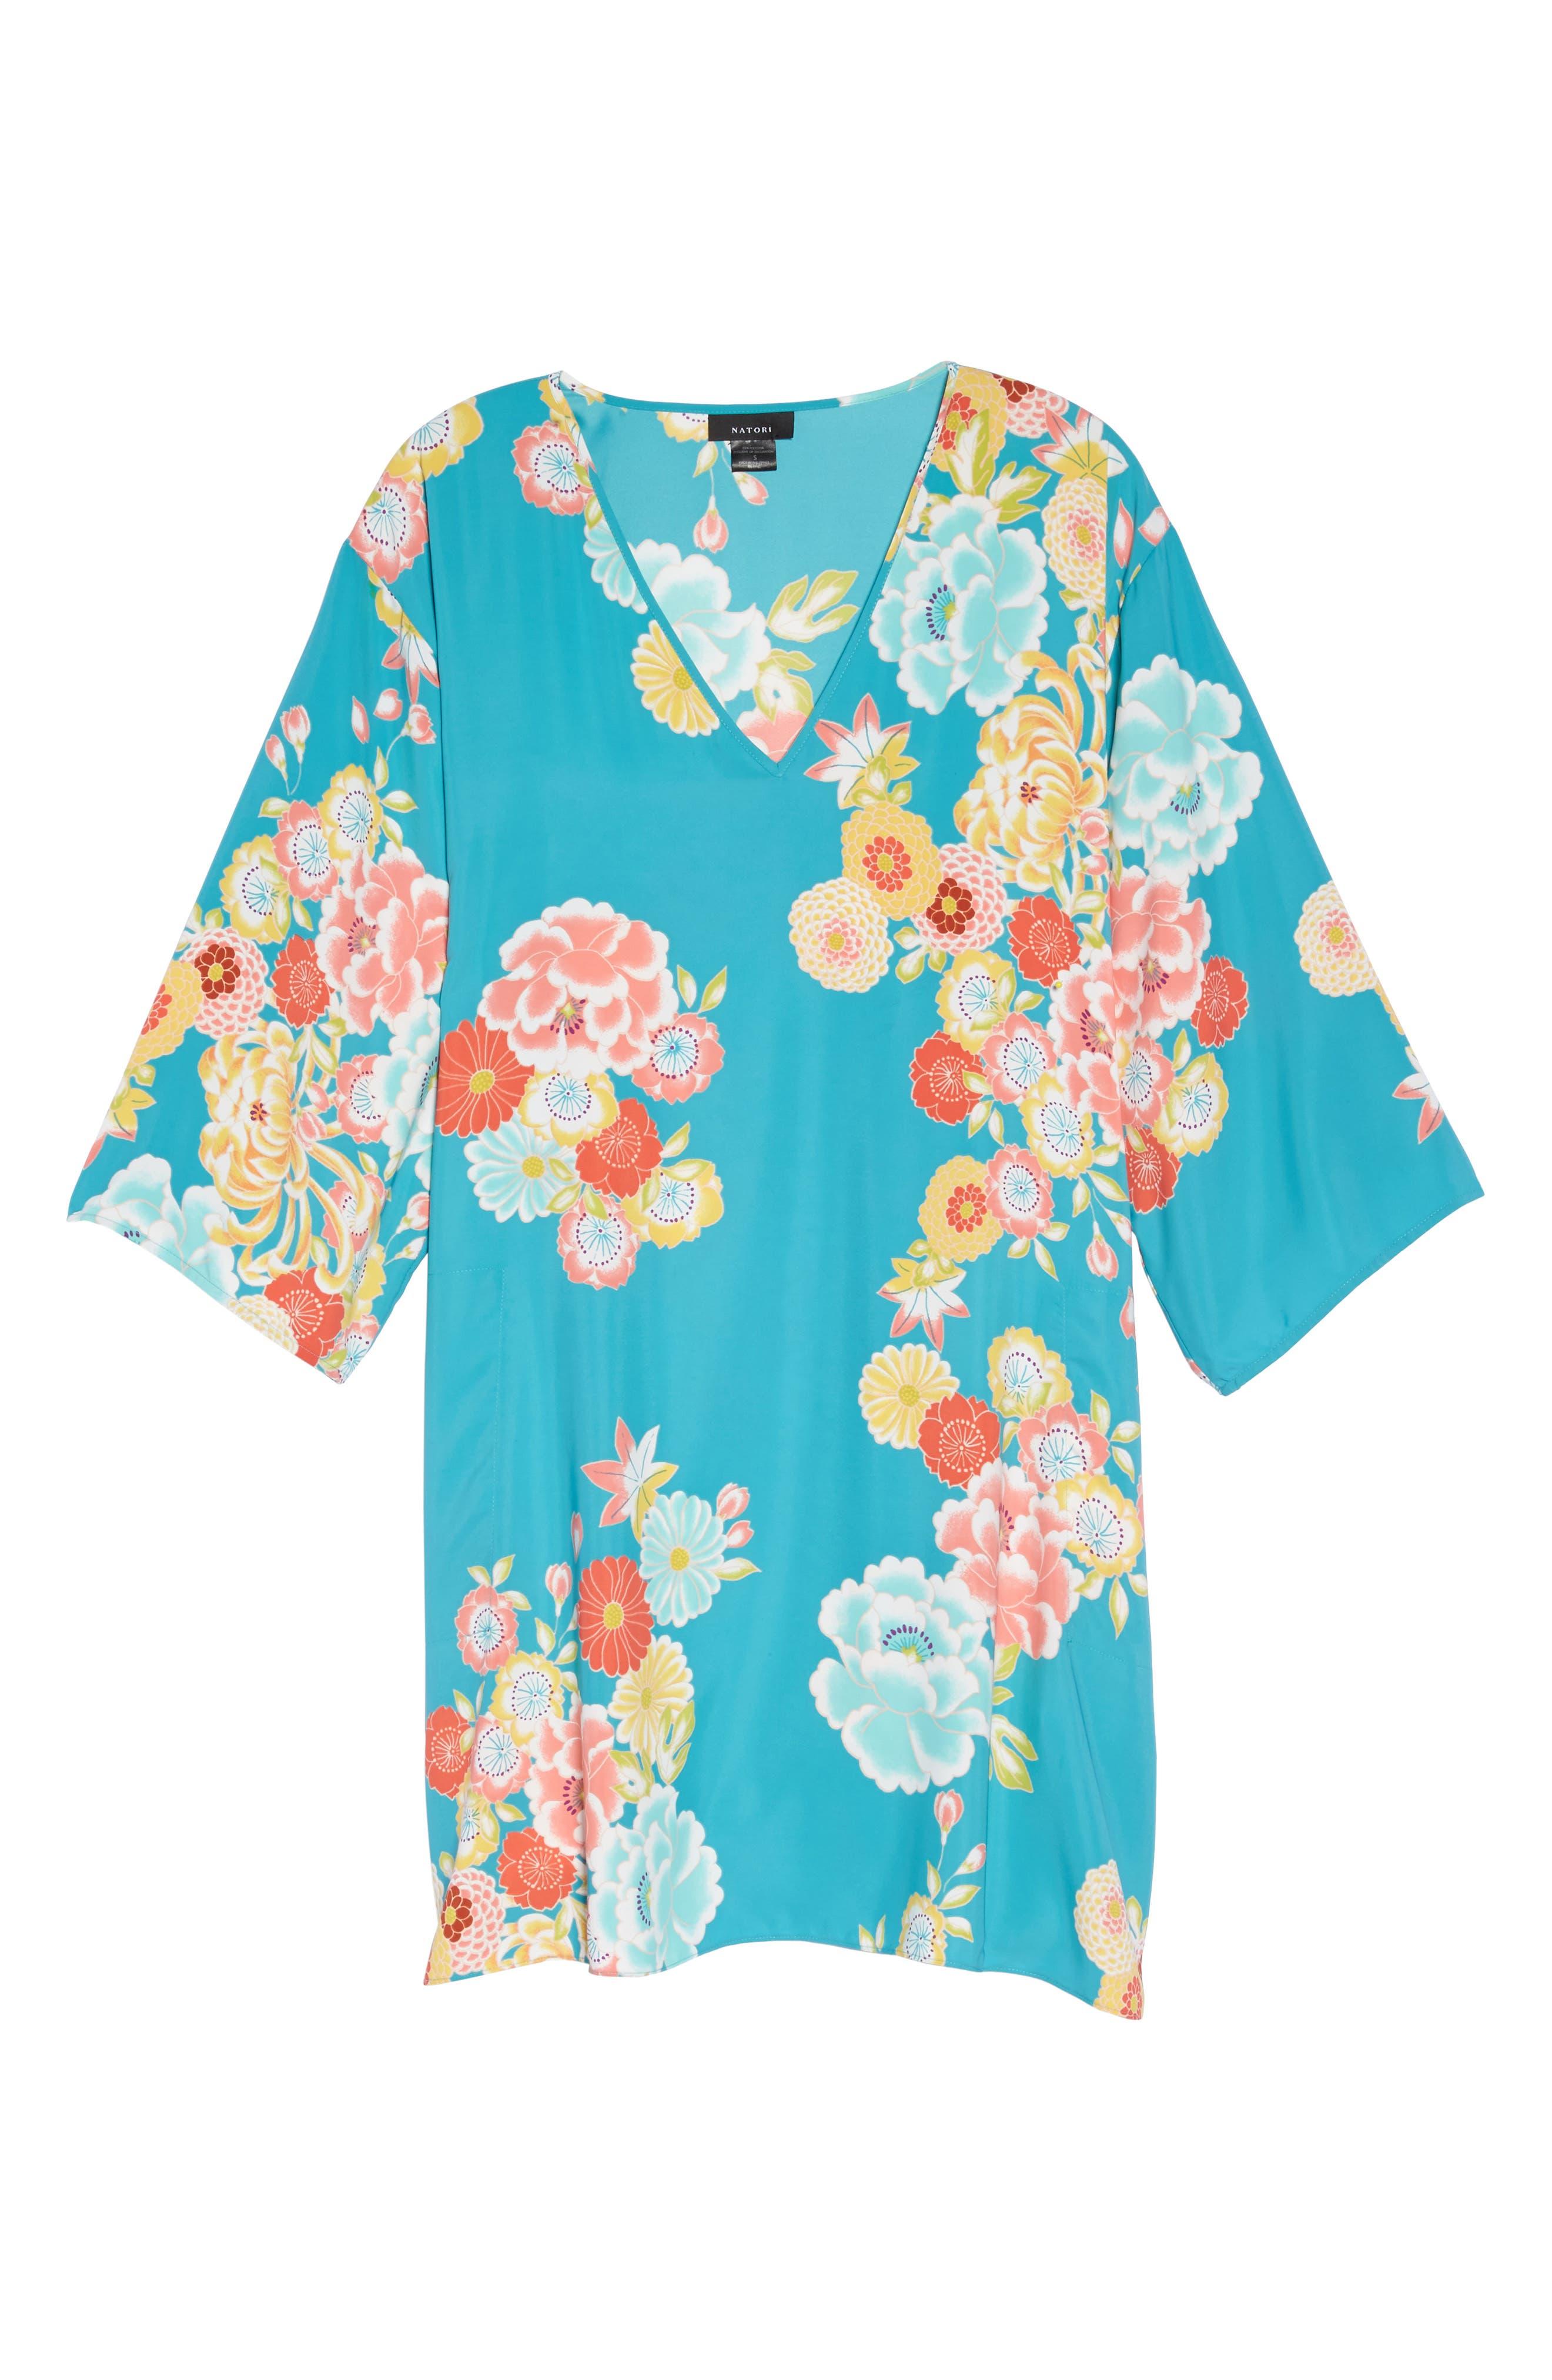 Saipan Caftan,                             Alternate thumbnail 4, color,                             Blue Turquoise